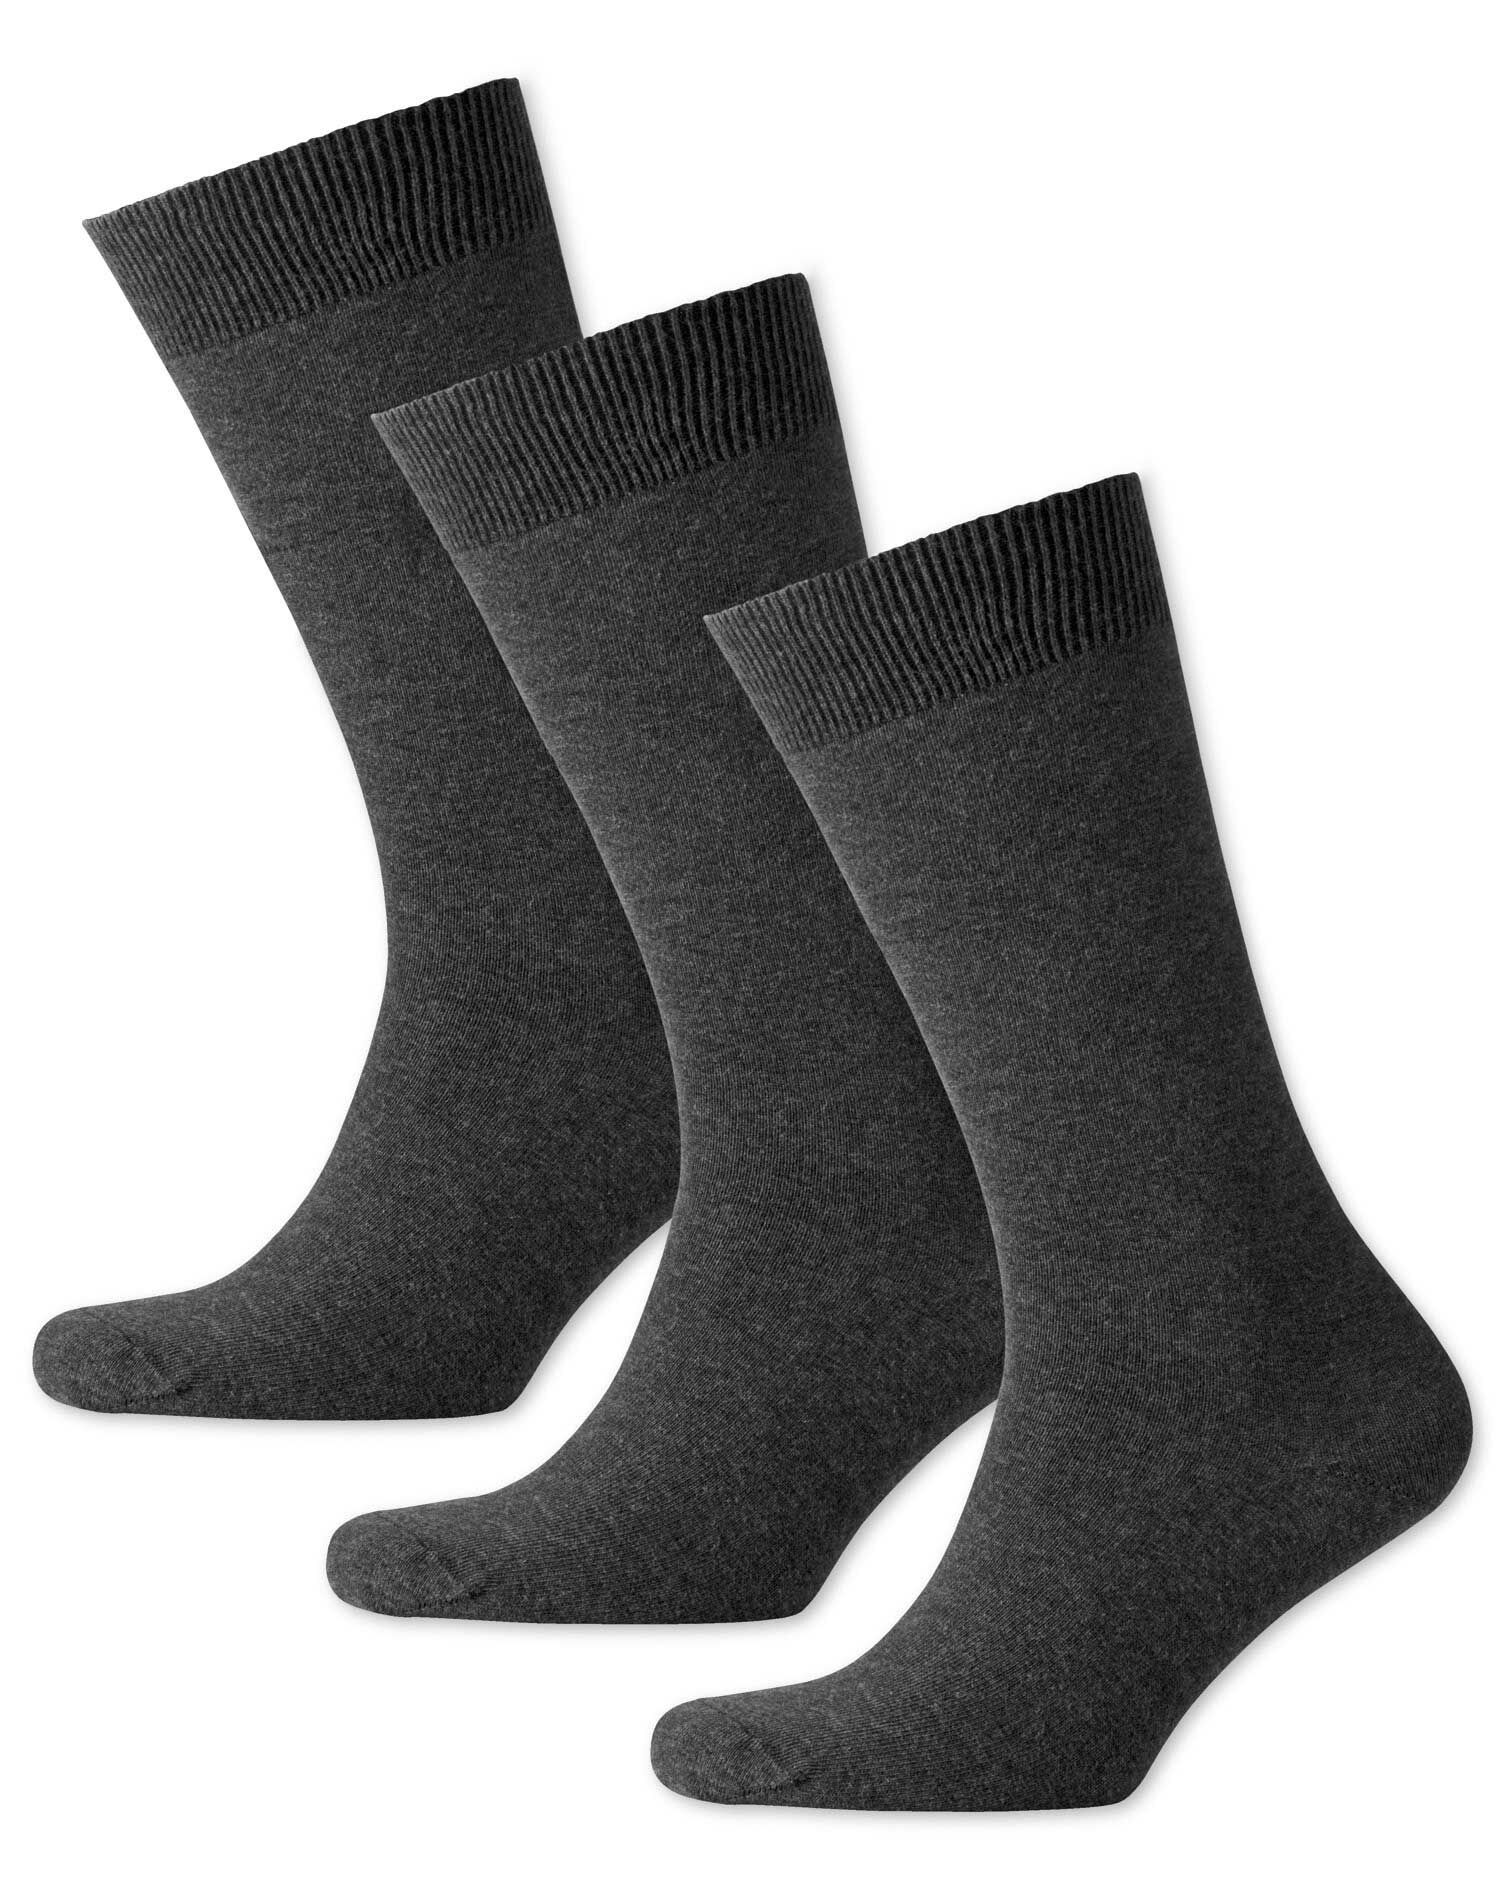 Grey Cotton Rich 3 Pack Socks Size Medium by Charles Tyrwhitt